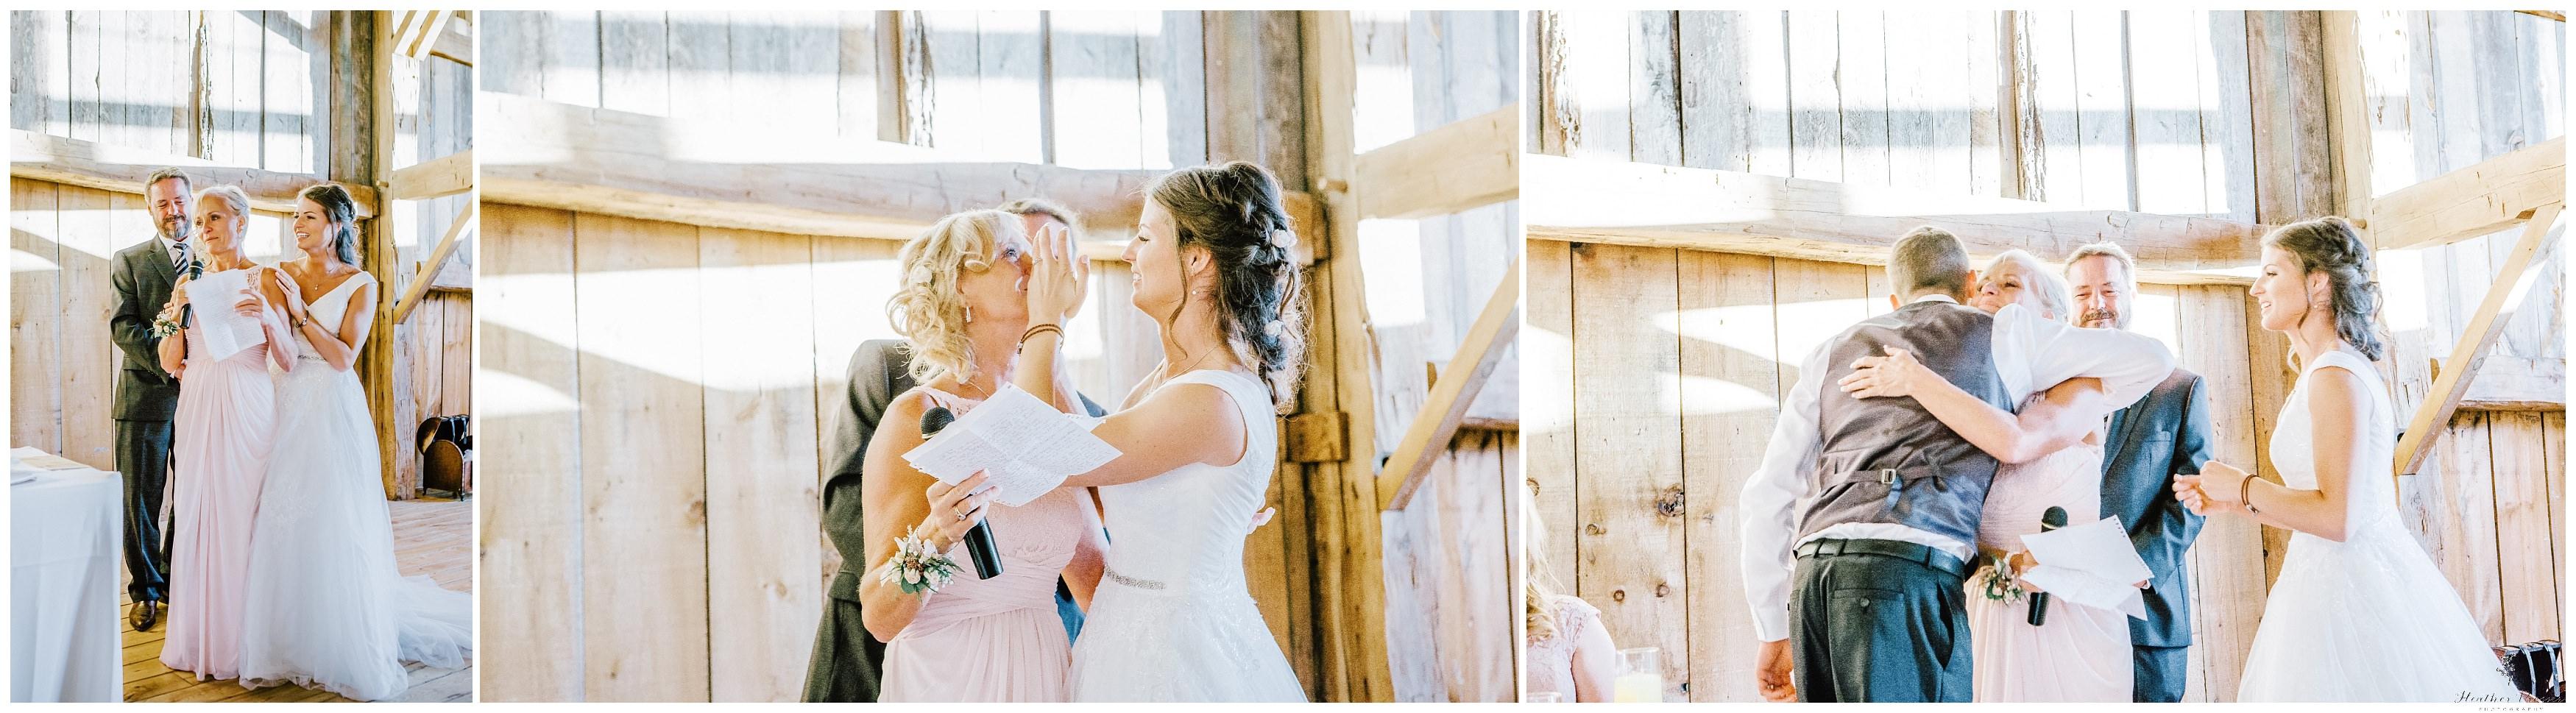 Ontario Barn Wedding_2251.jpg